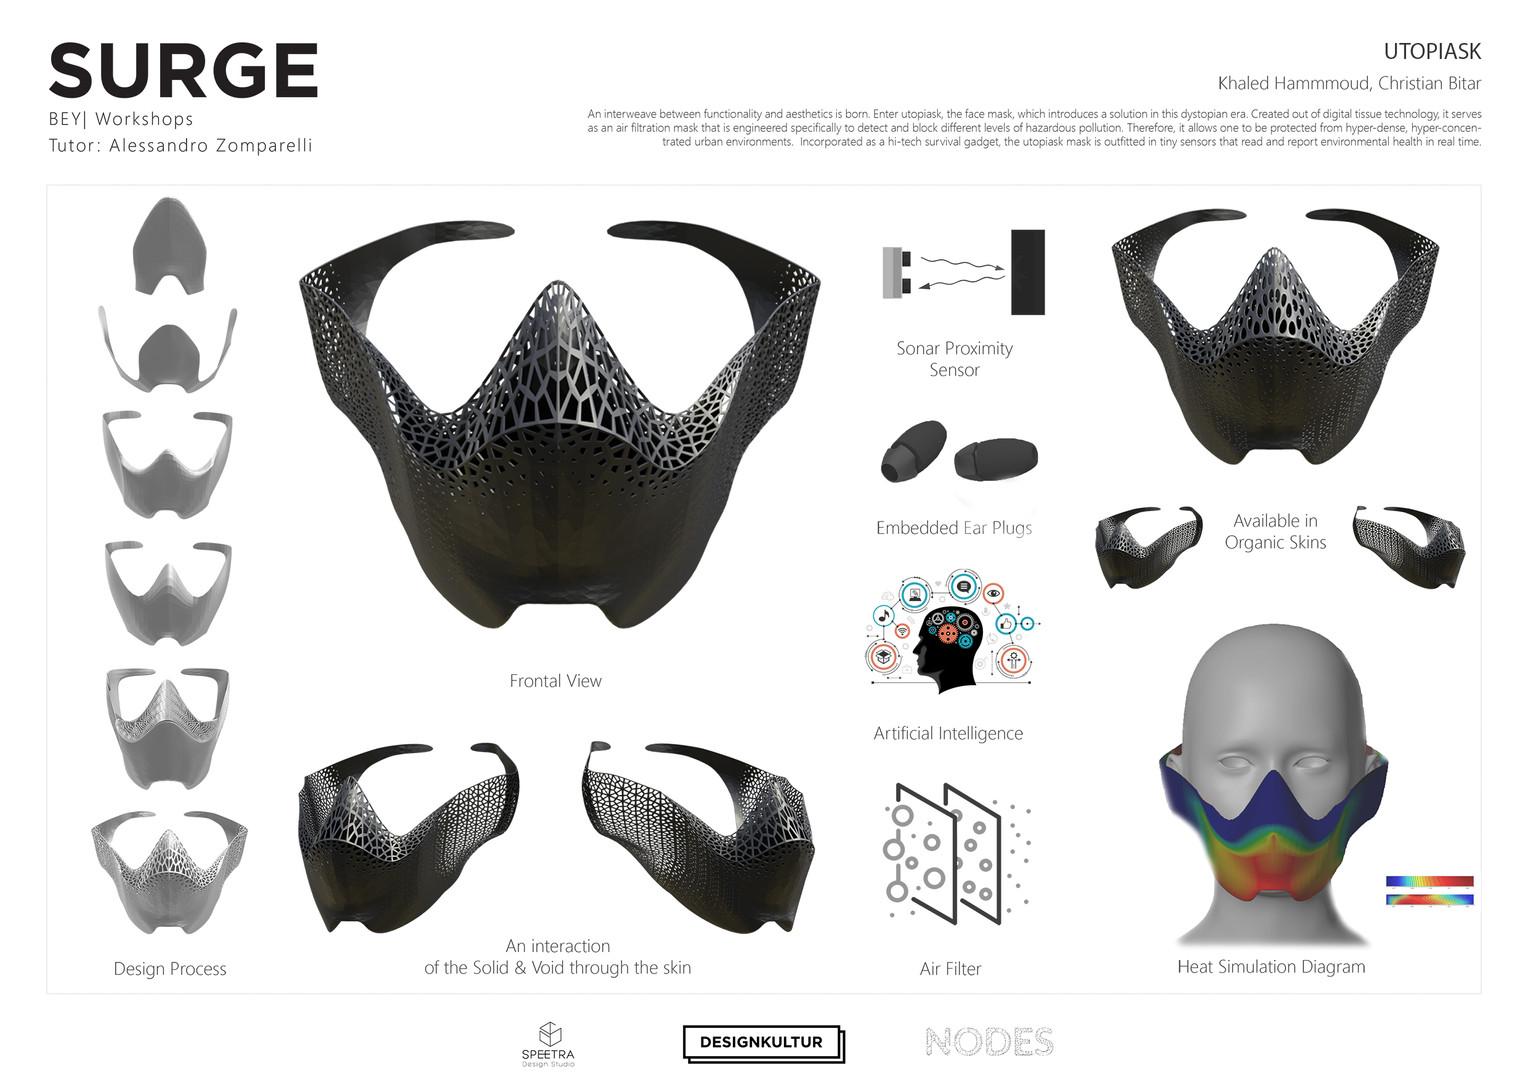 SURGE: The birth of hybrid accessories